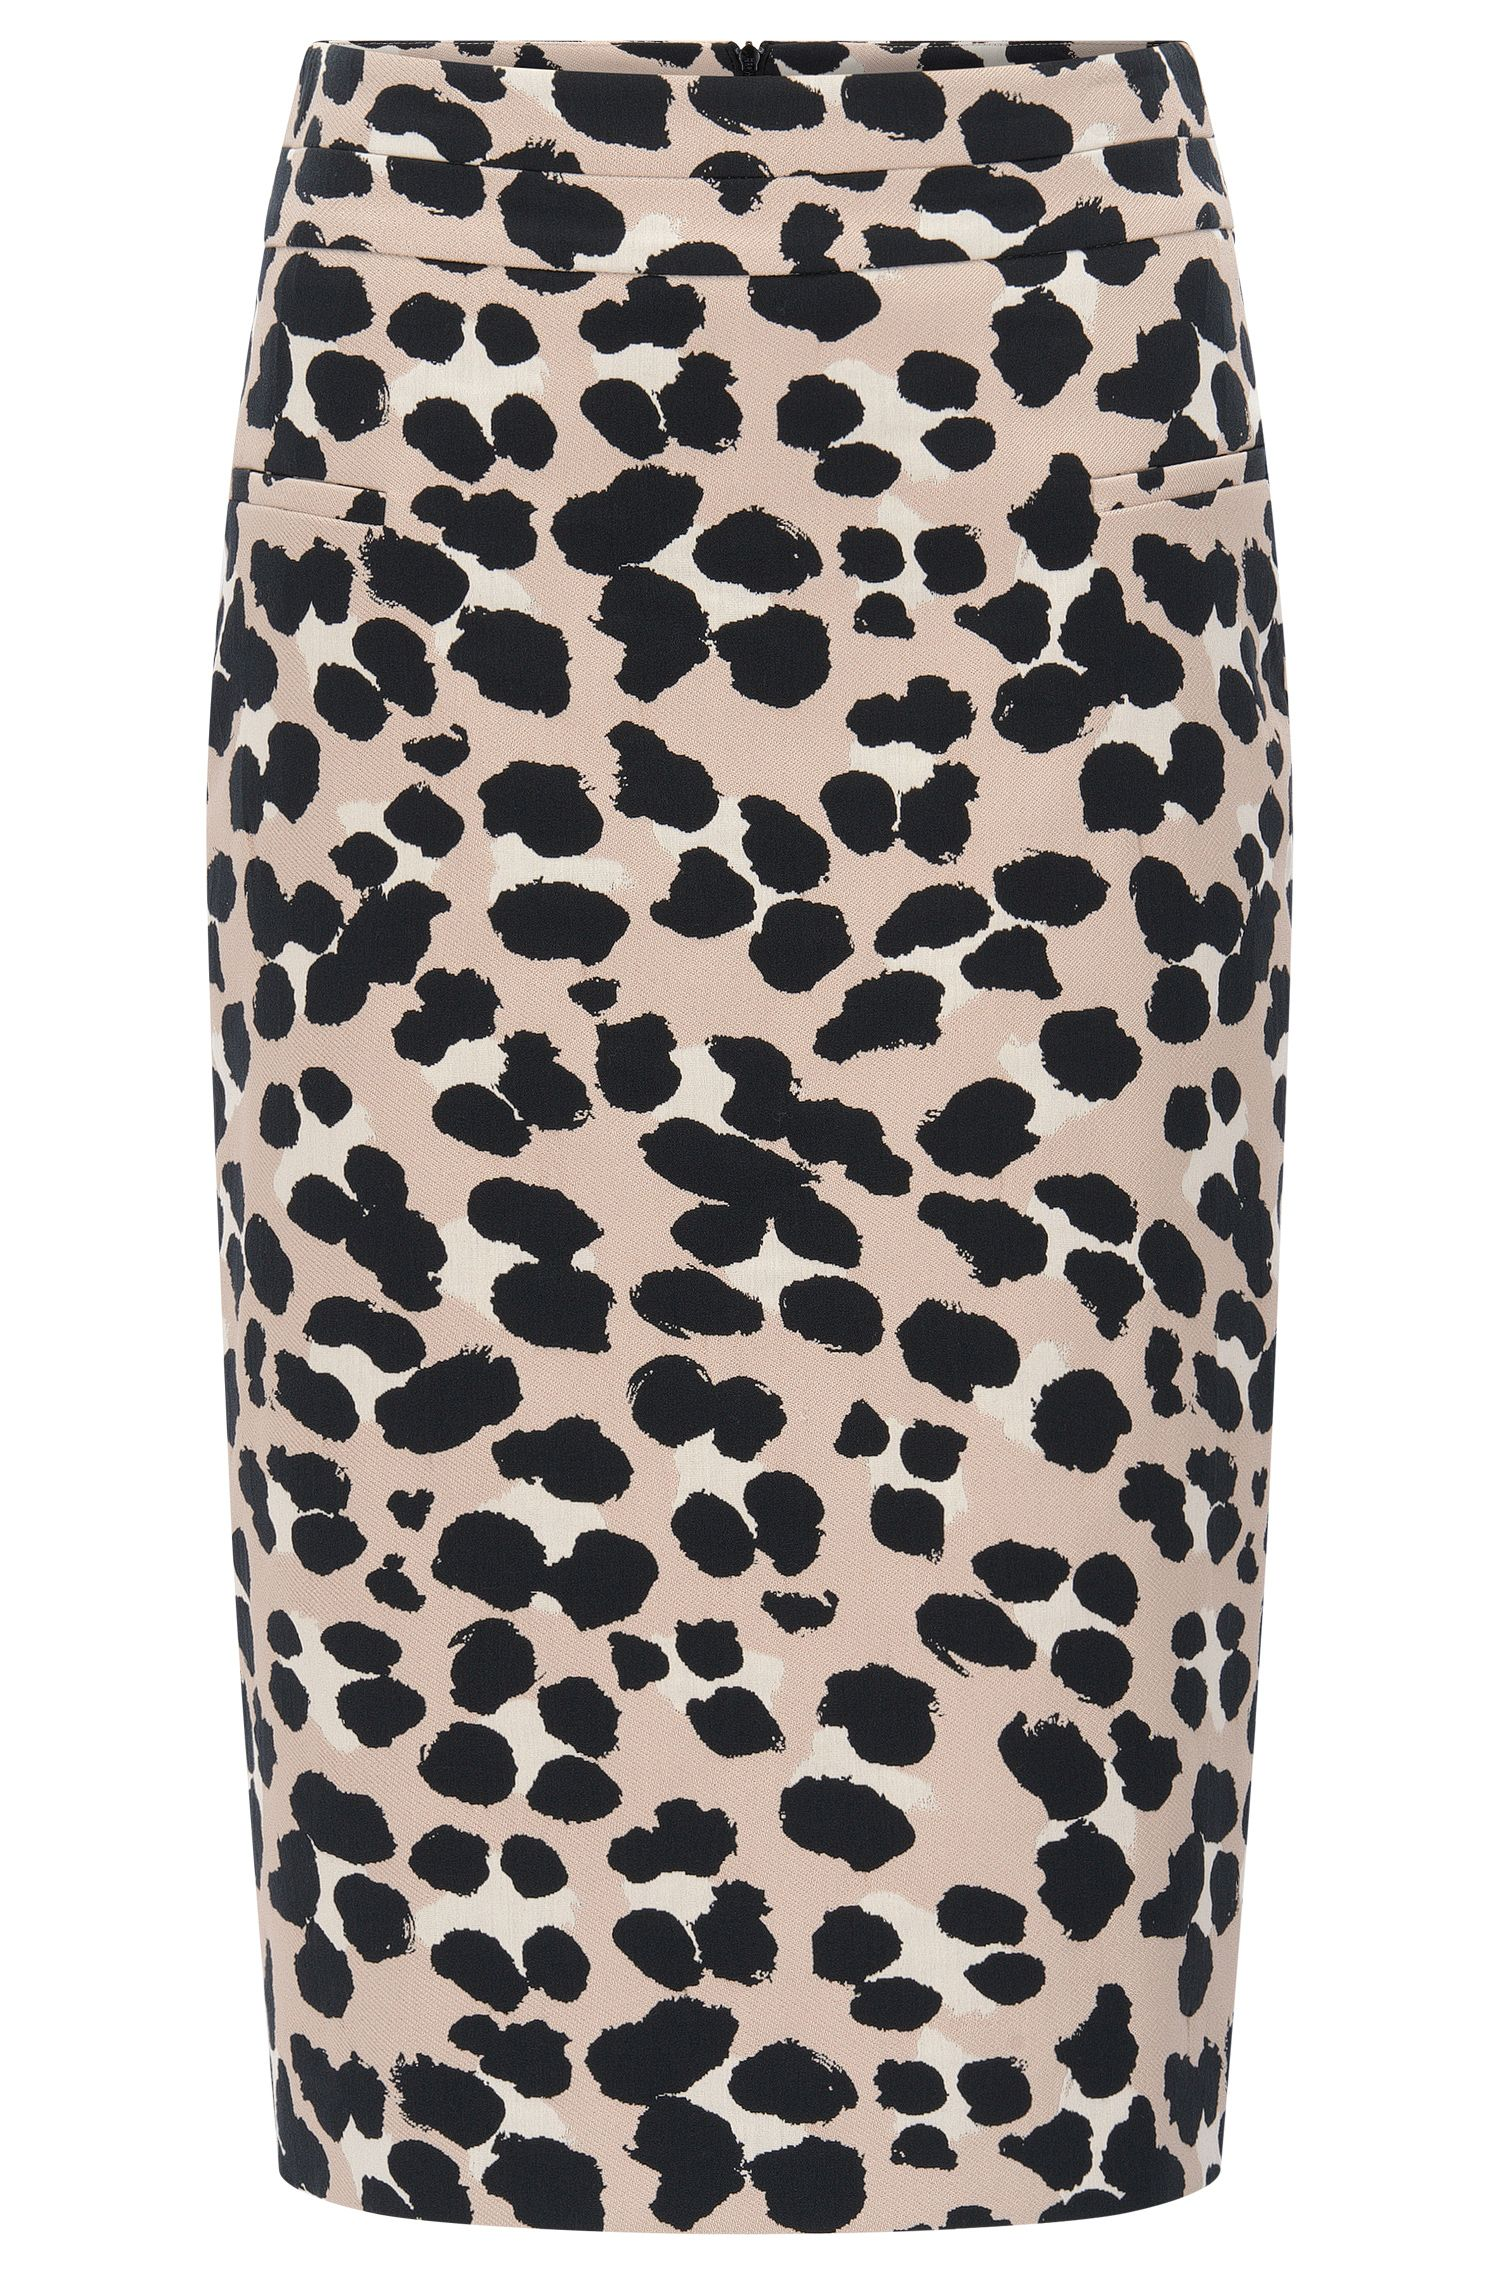 Kokerrok in een jacquard met cheetahprint